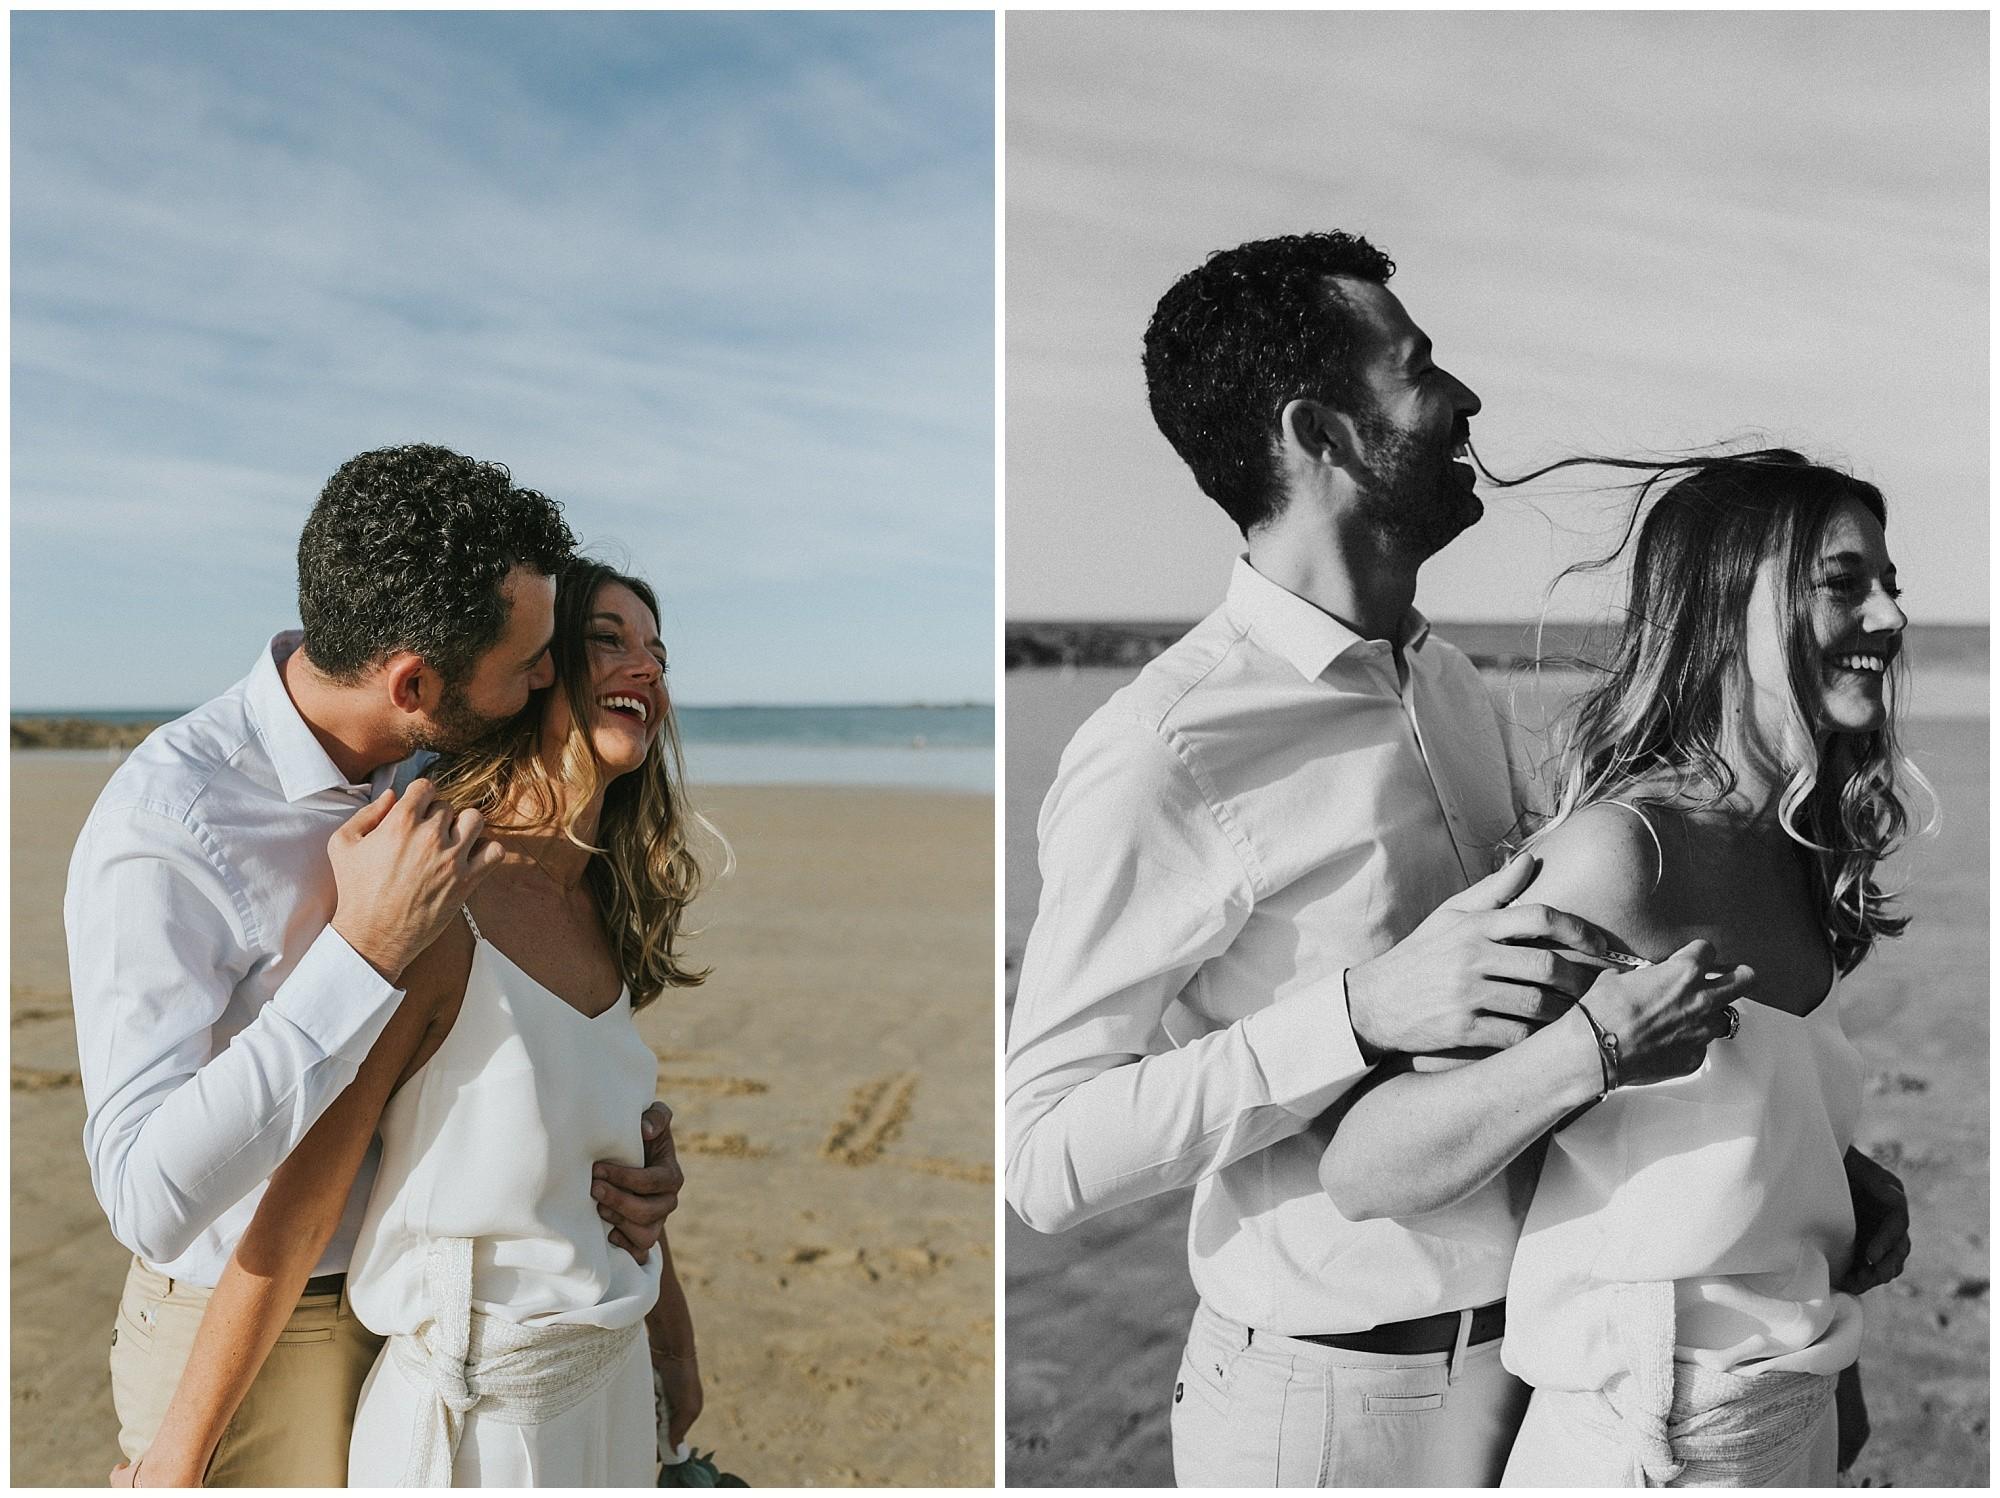 Kateryna-photos-photographe-mariage-bretagne-saint-malo-finistere-cotes-darmor-wedding_0066.jpg